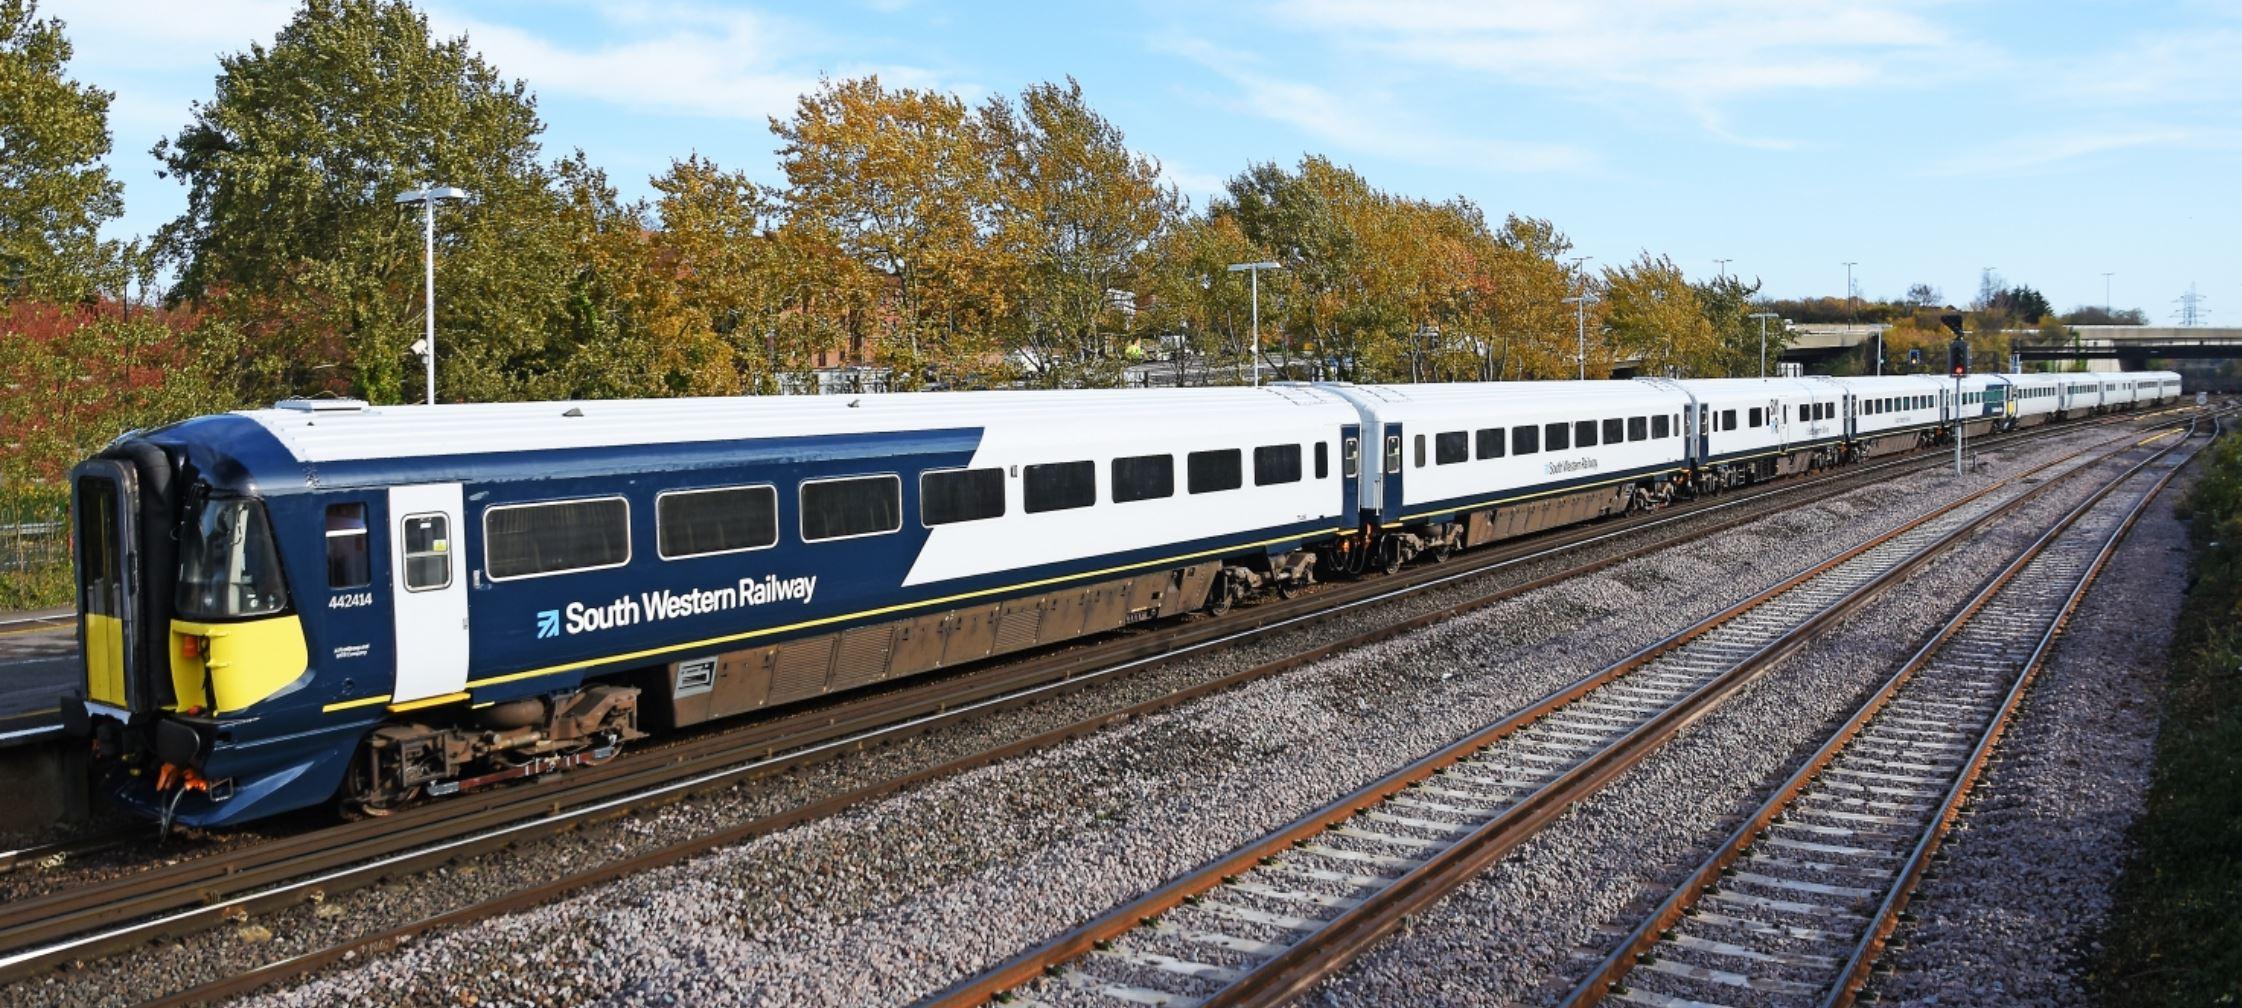 Class 442 Modification - Gemini Rail Group